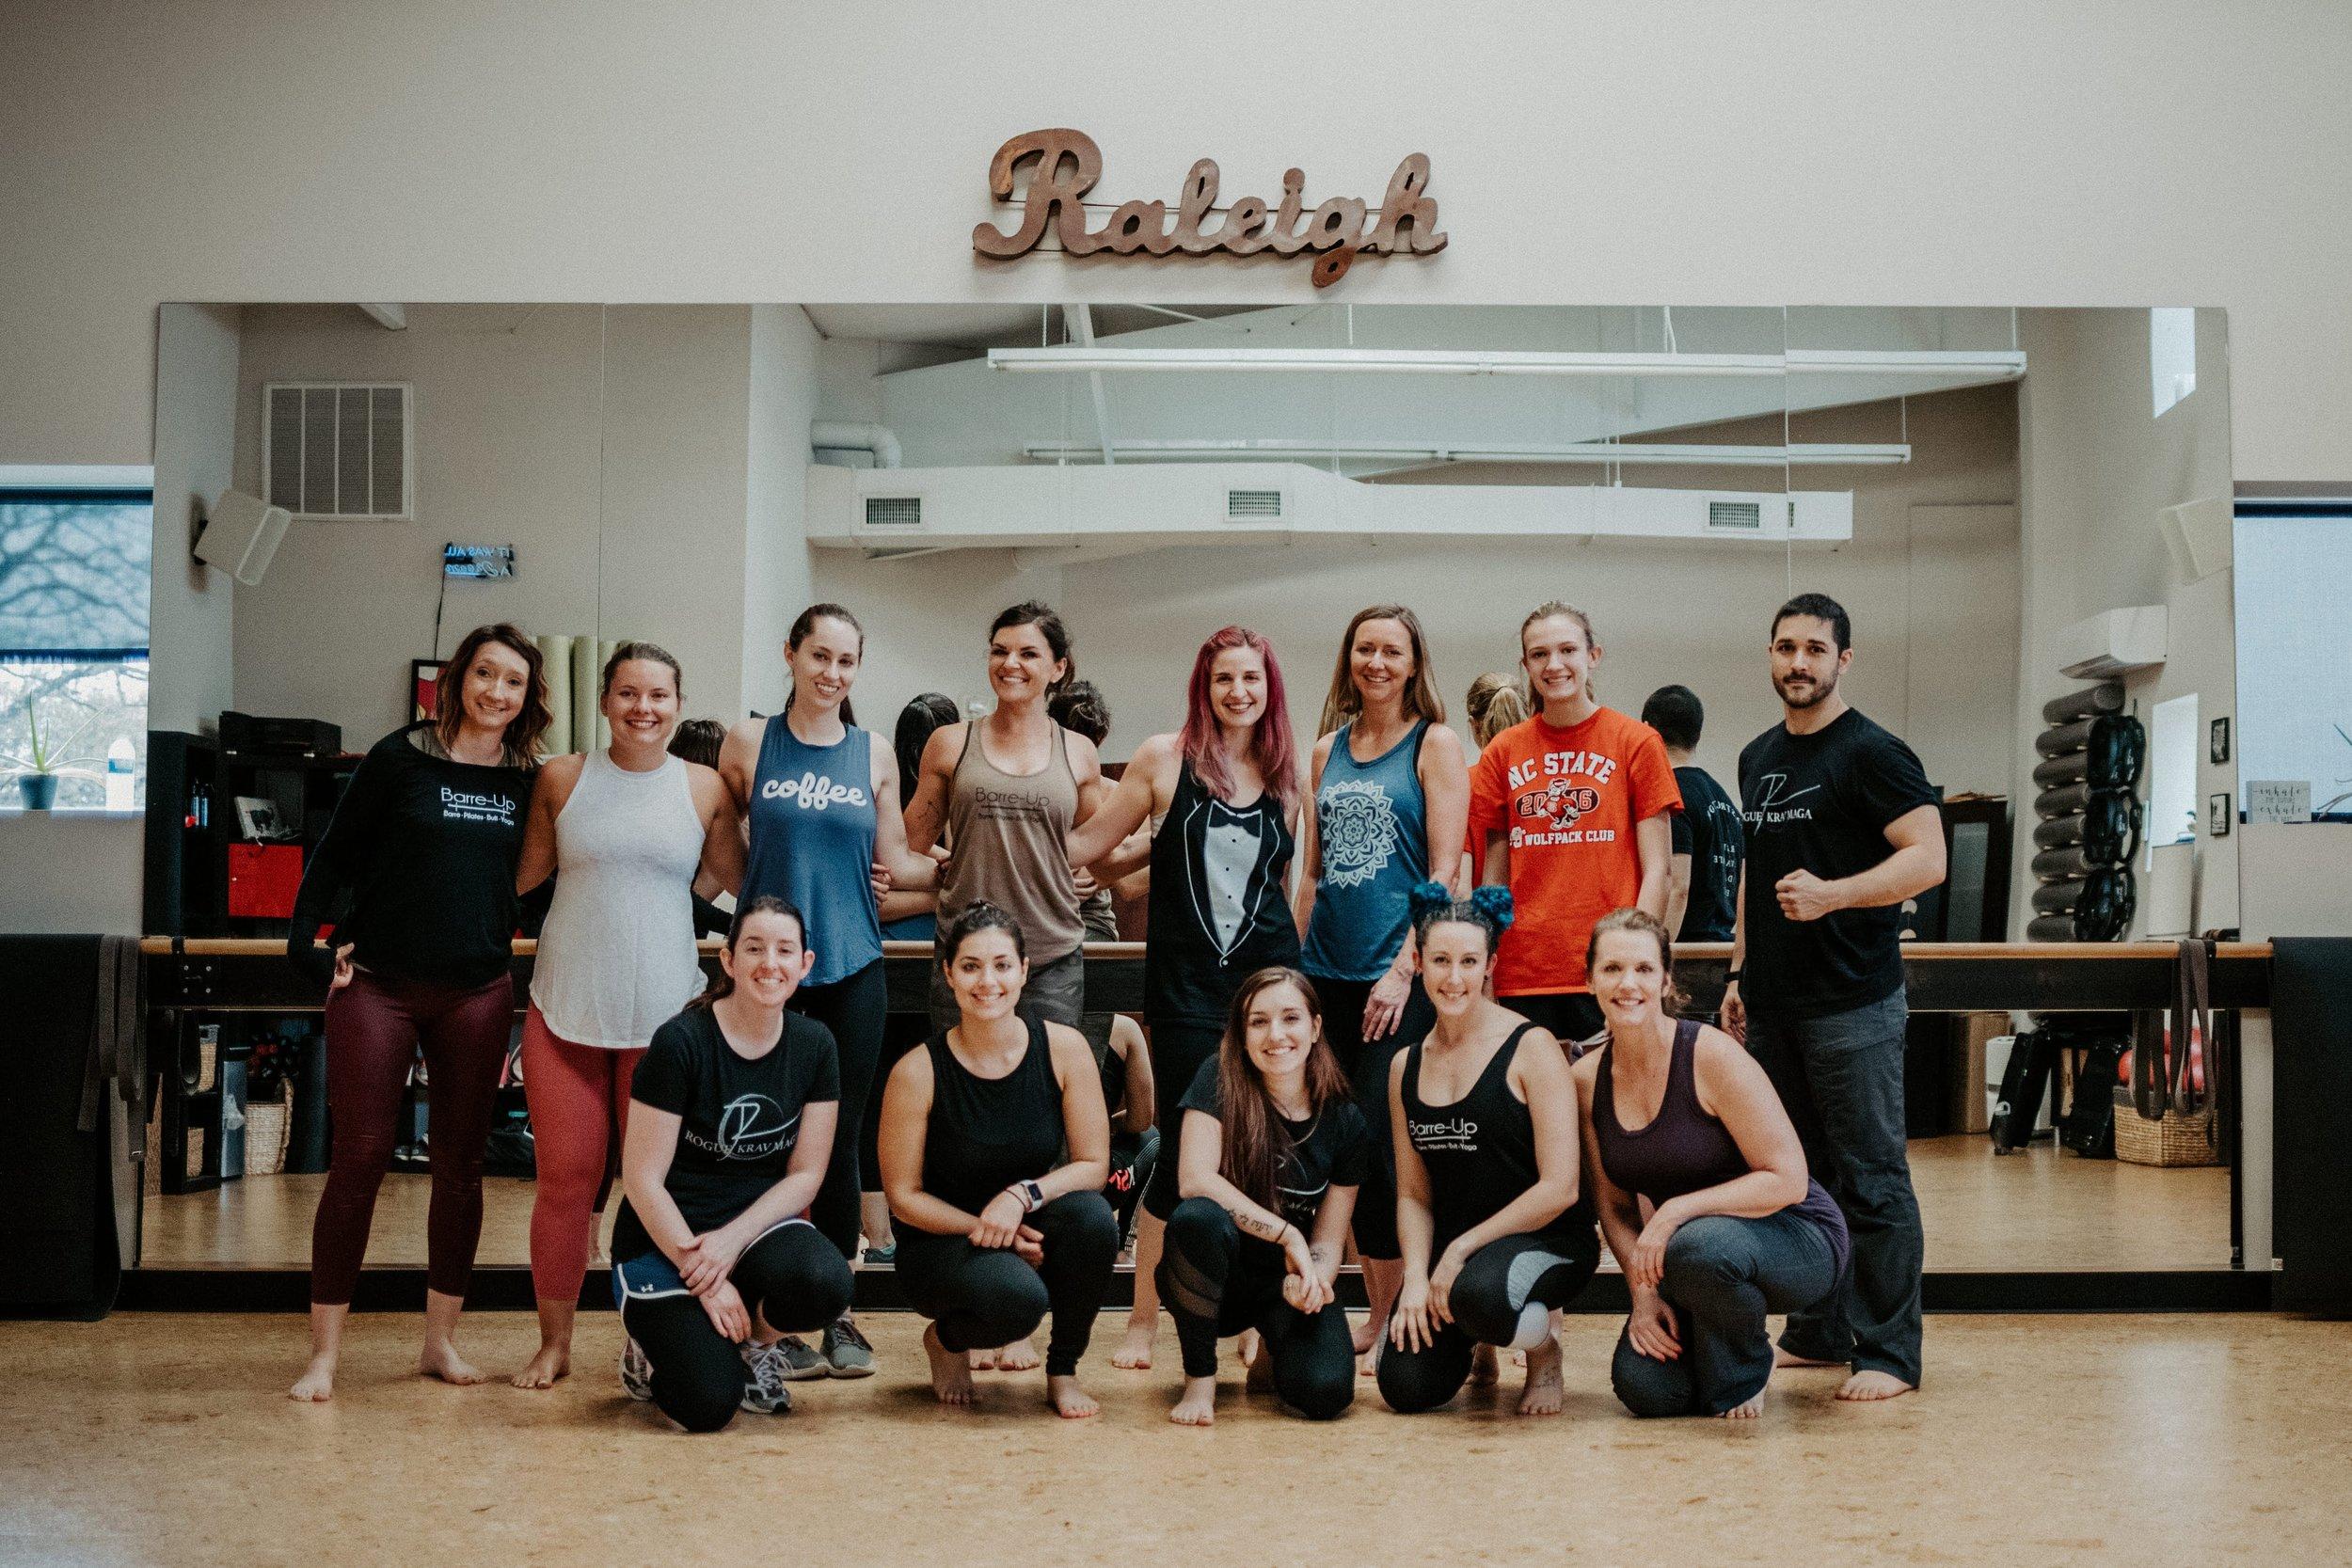 mefirst women's self defense seminar Raleigh nc